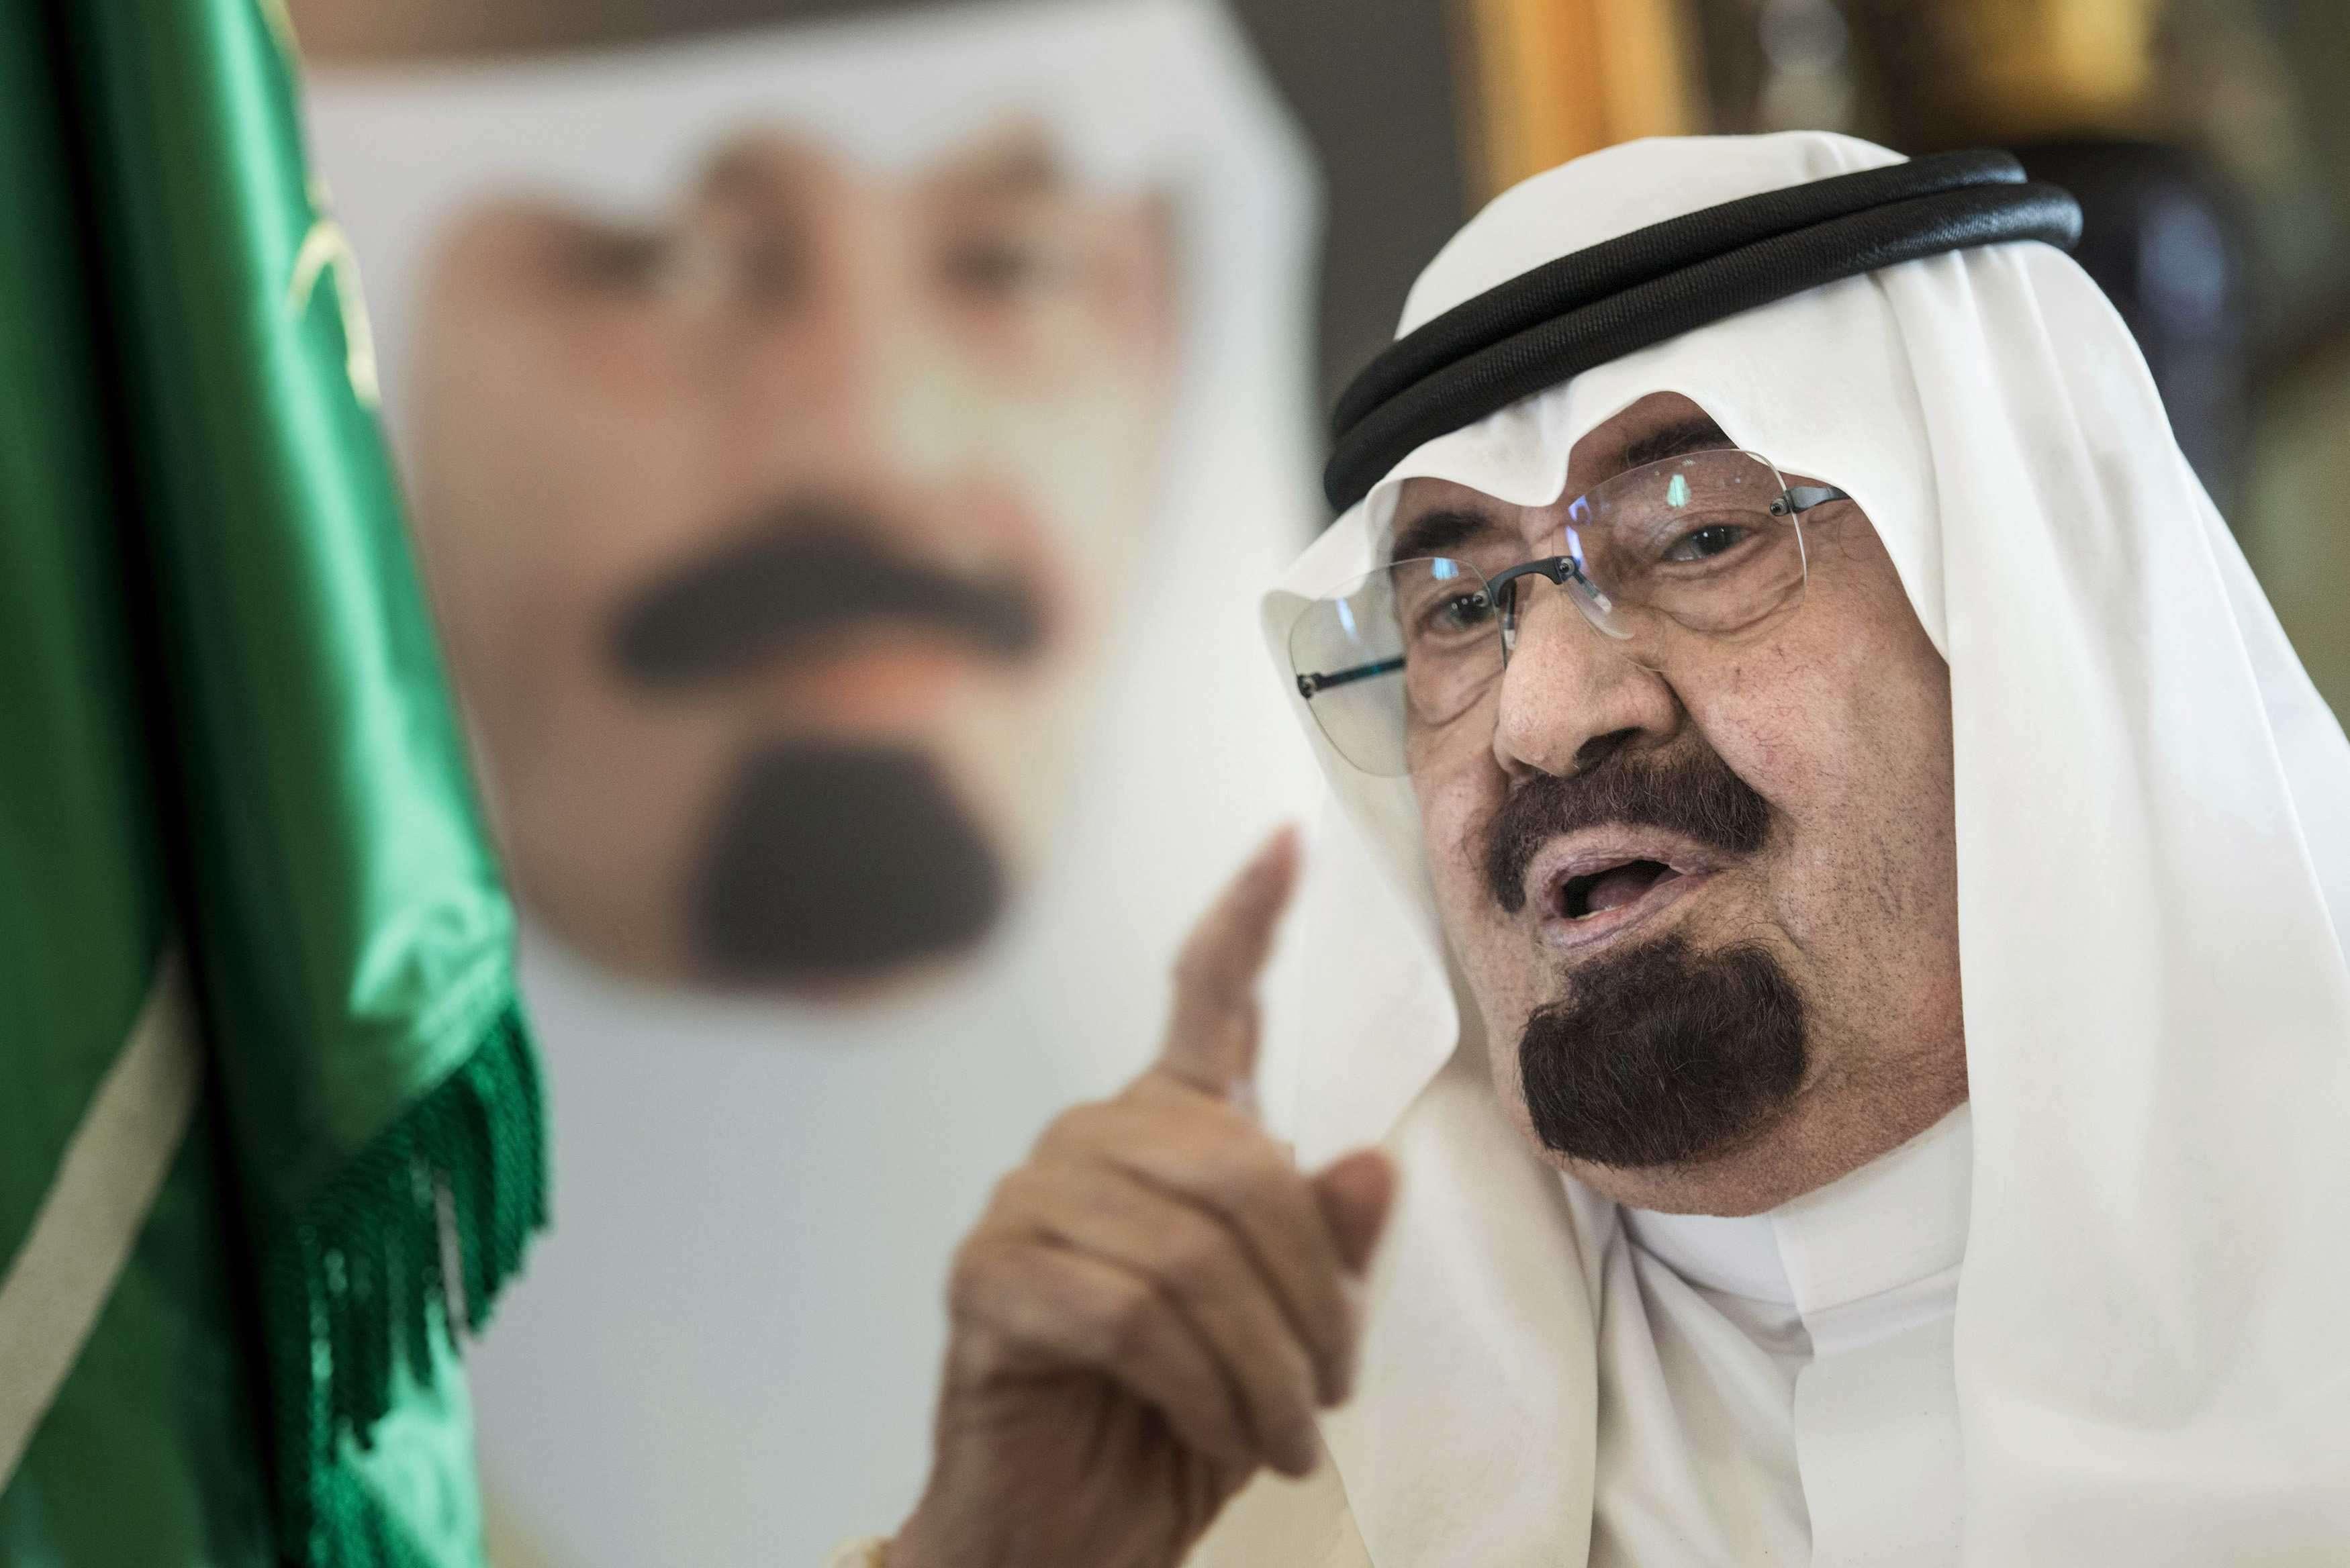 Ocidente é próximo alvo de jihadistas, afirma rei saudita